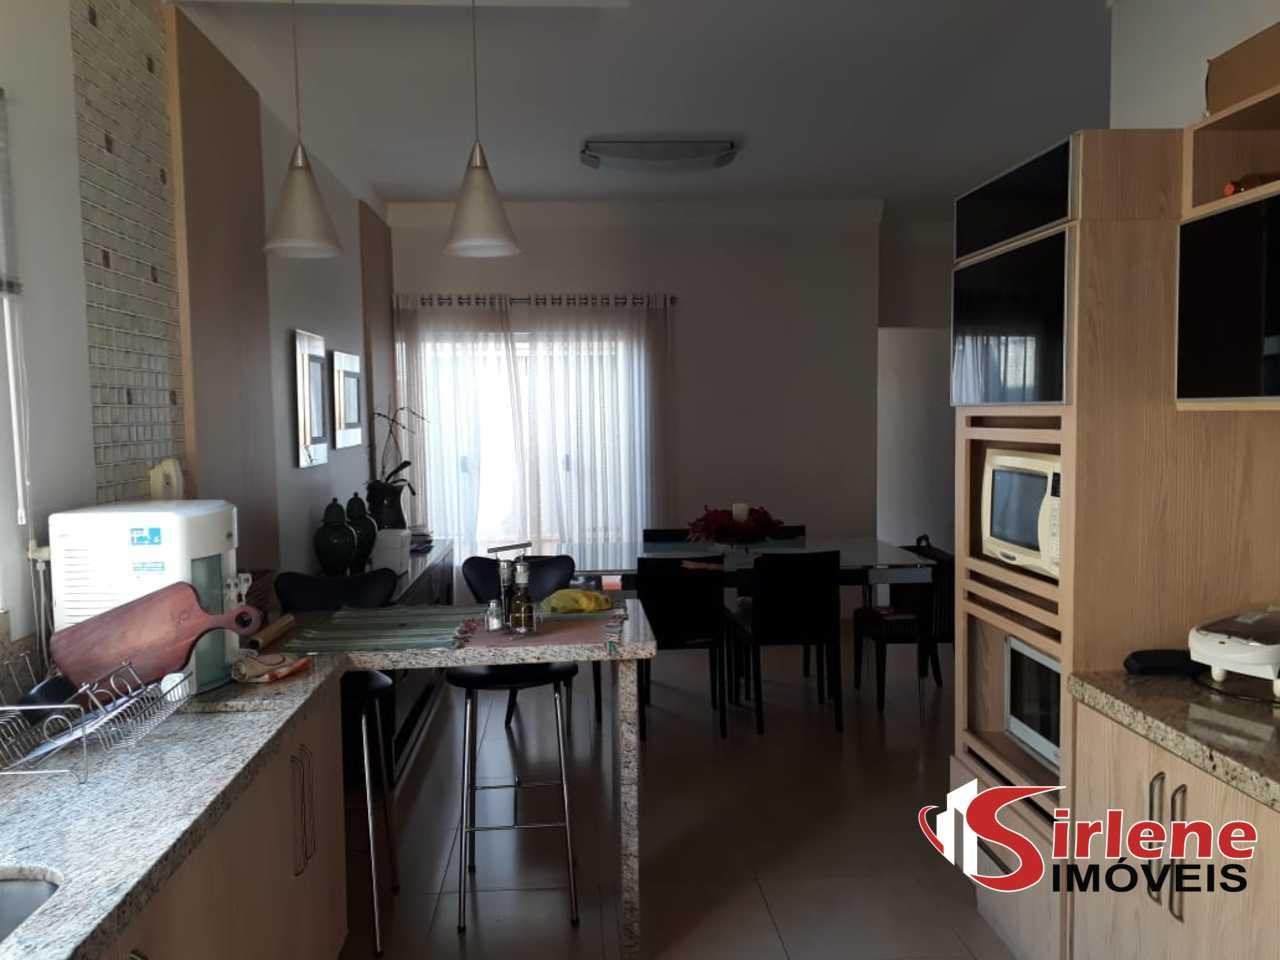 Imobiliária em Rio Verde Imobiliaria  Sirlene Imóveis-nullnullnullnull